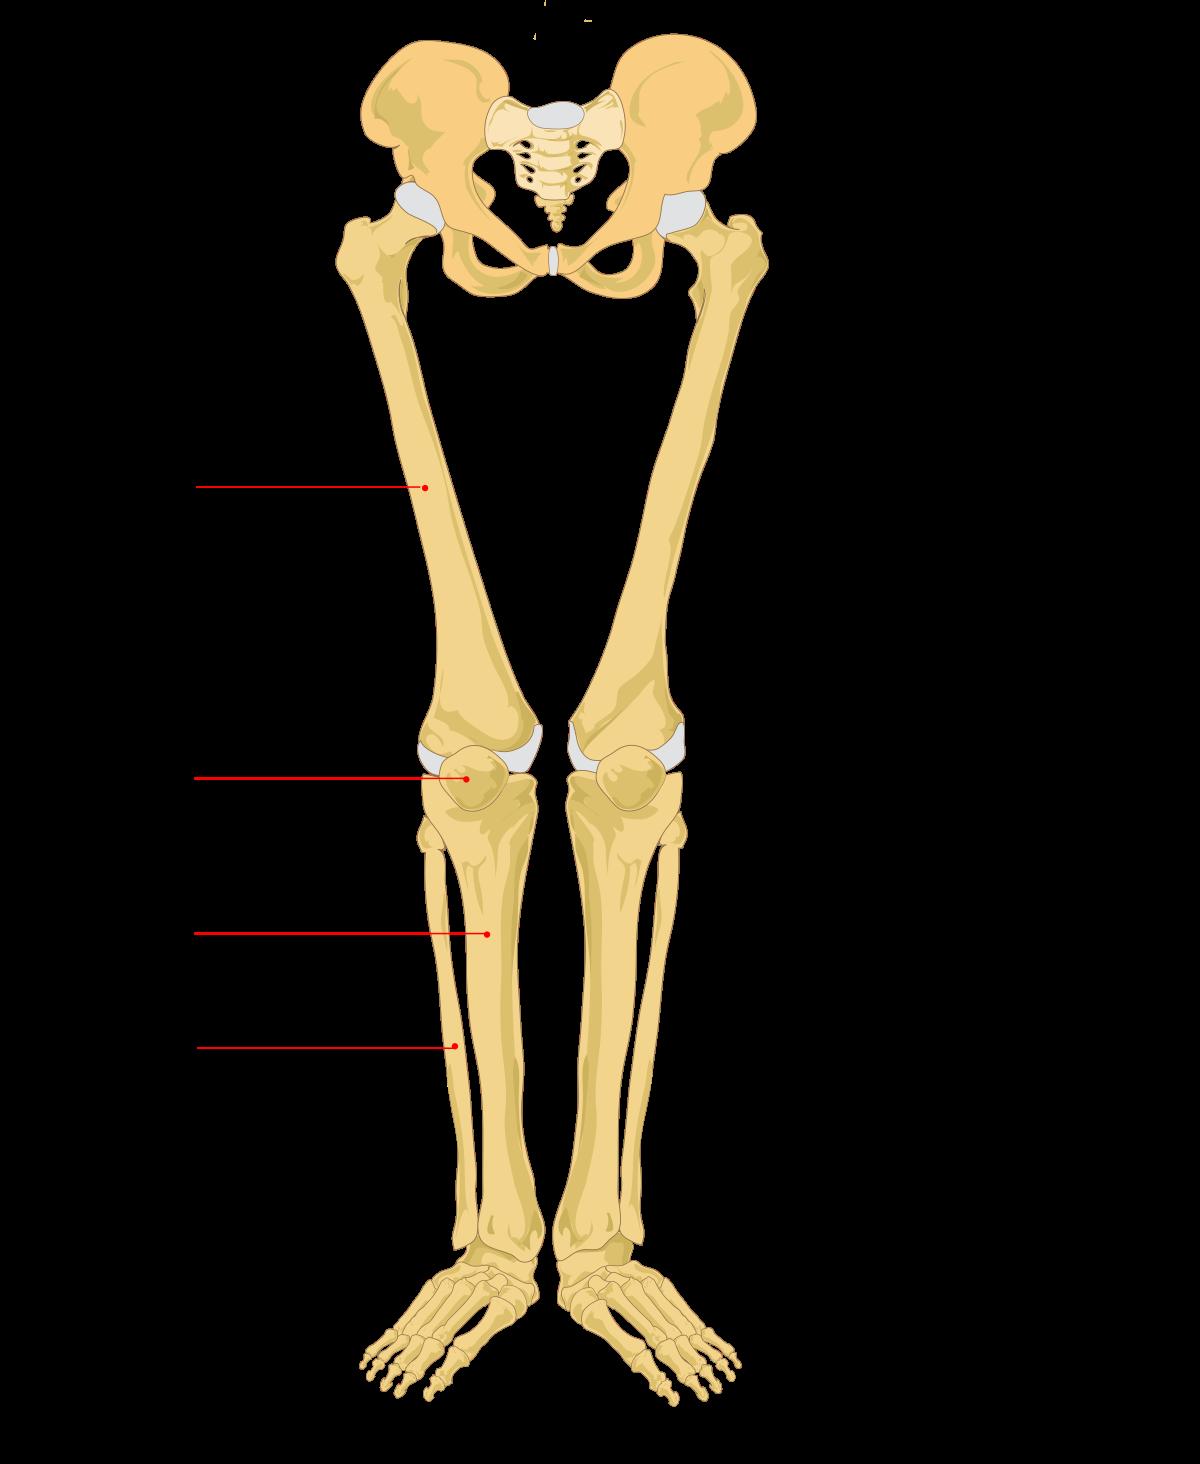 Skeleton skeleton leg